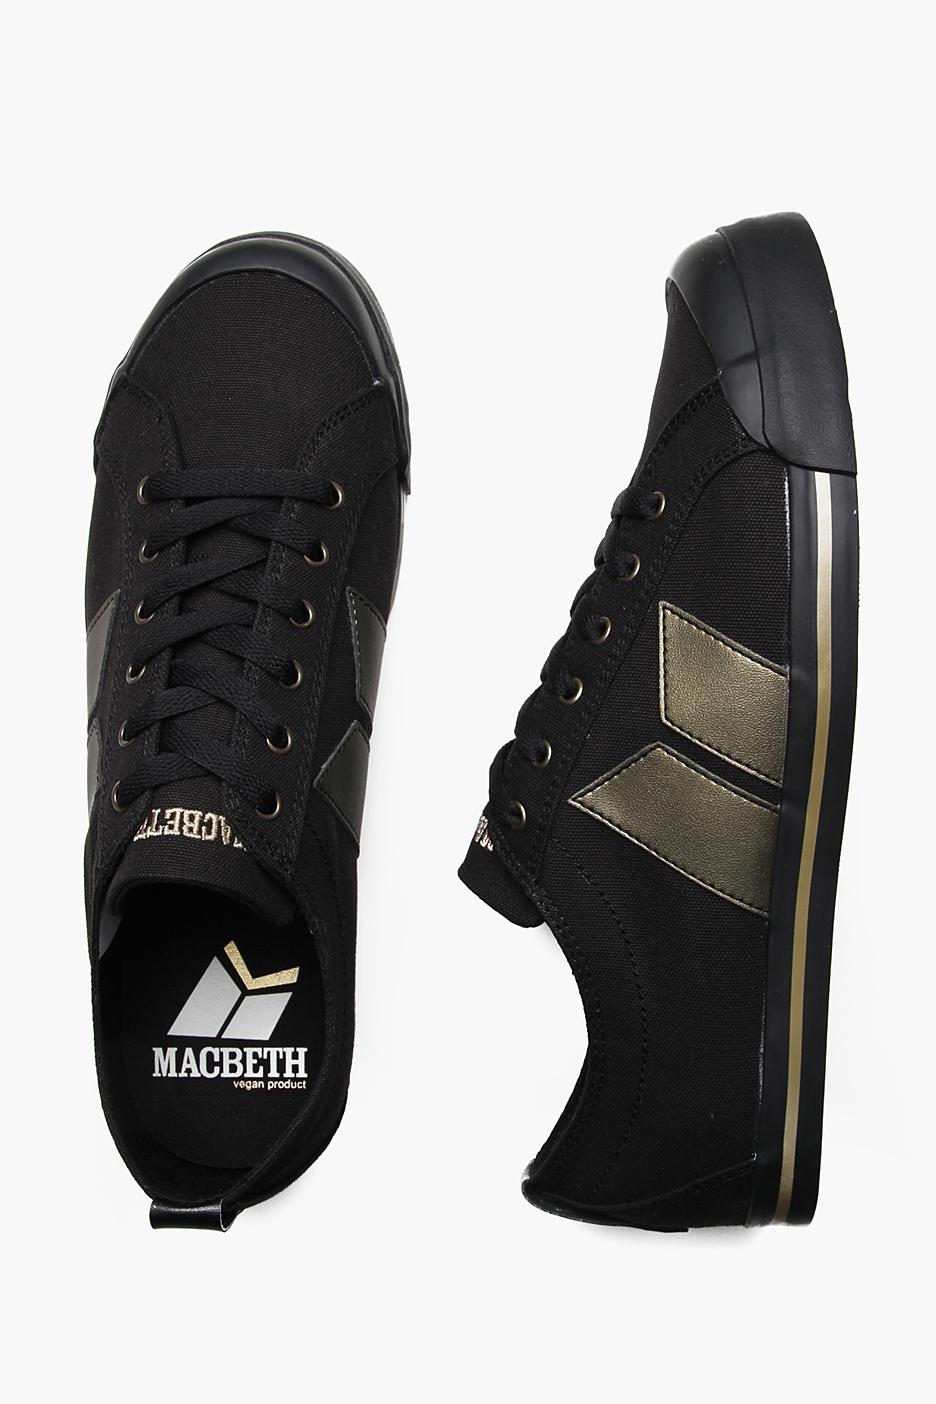 Macbeth Eliot Canvas BlackGold Schuhe